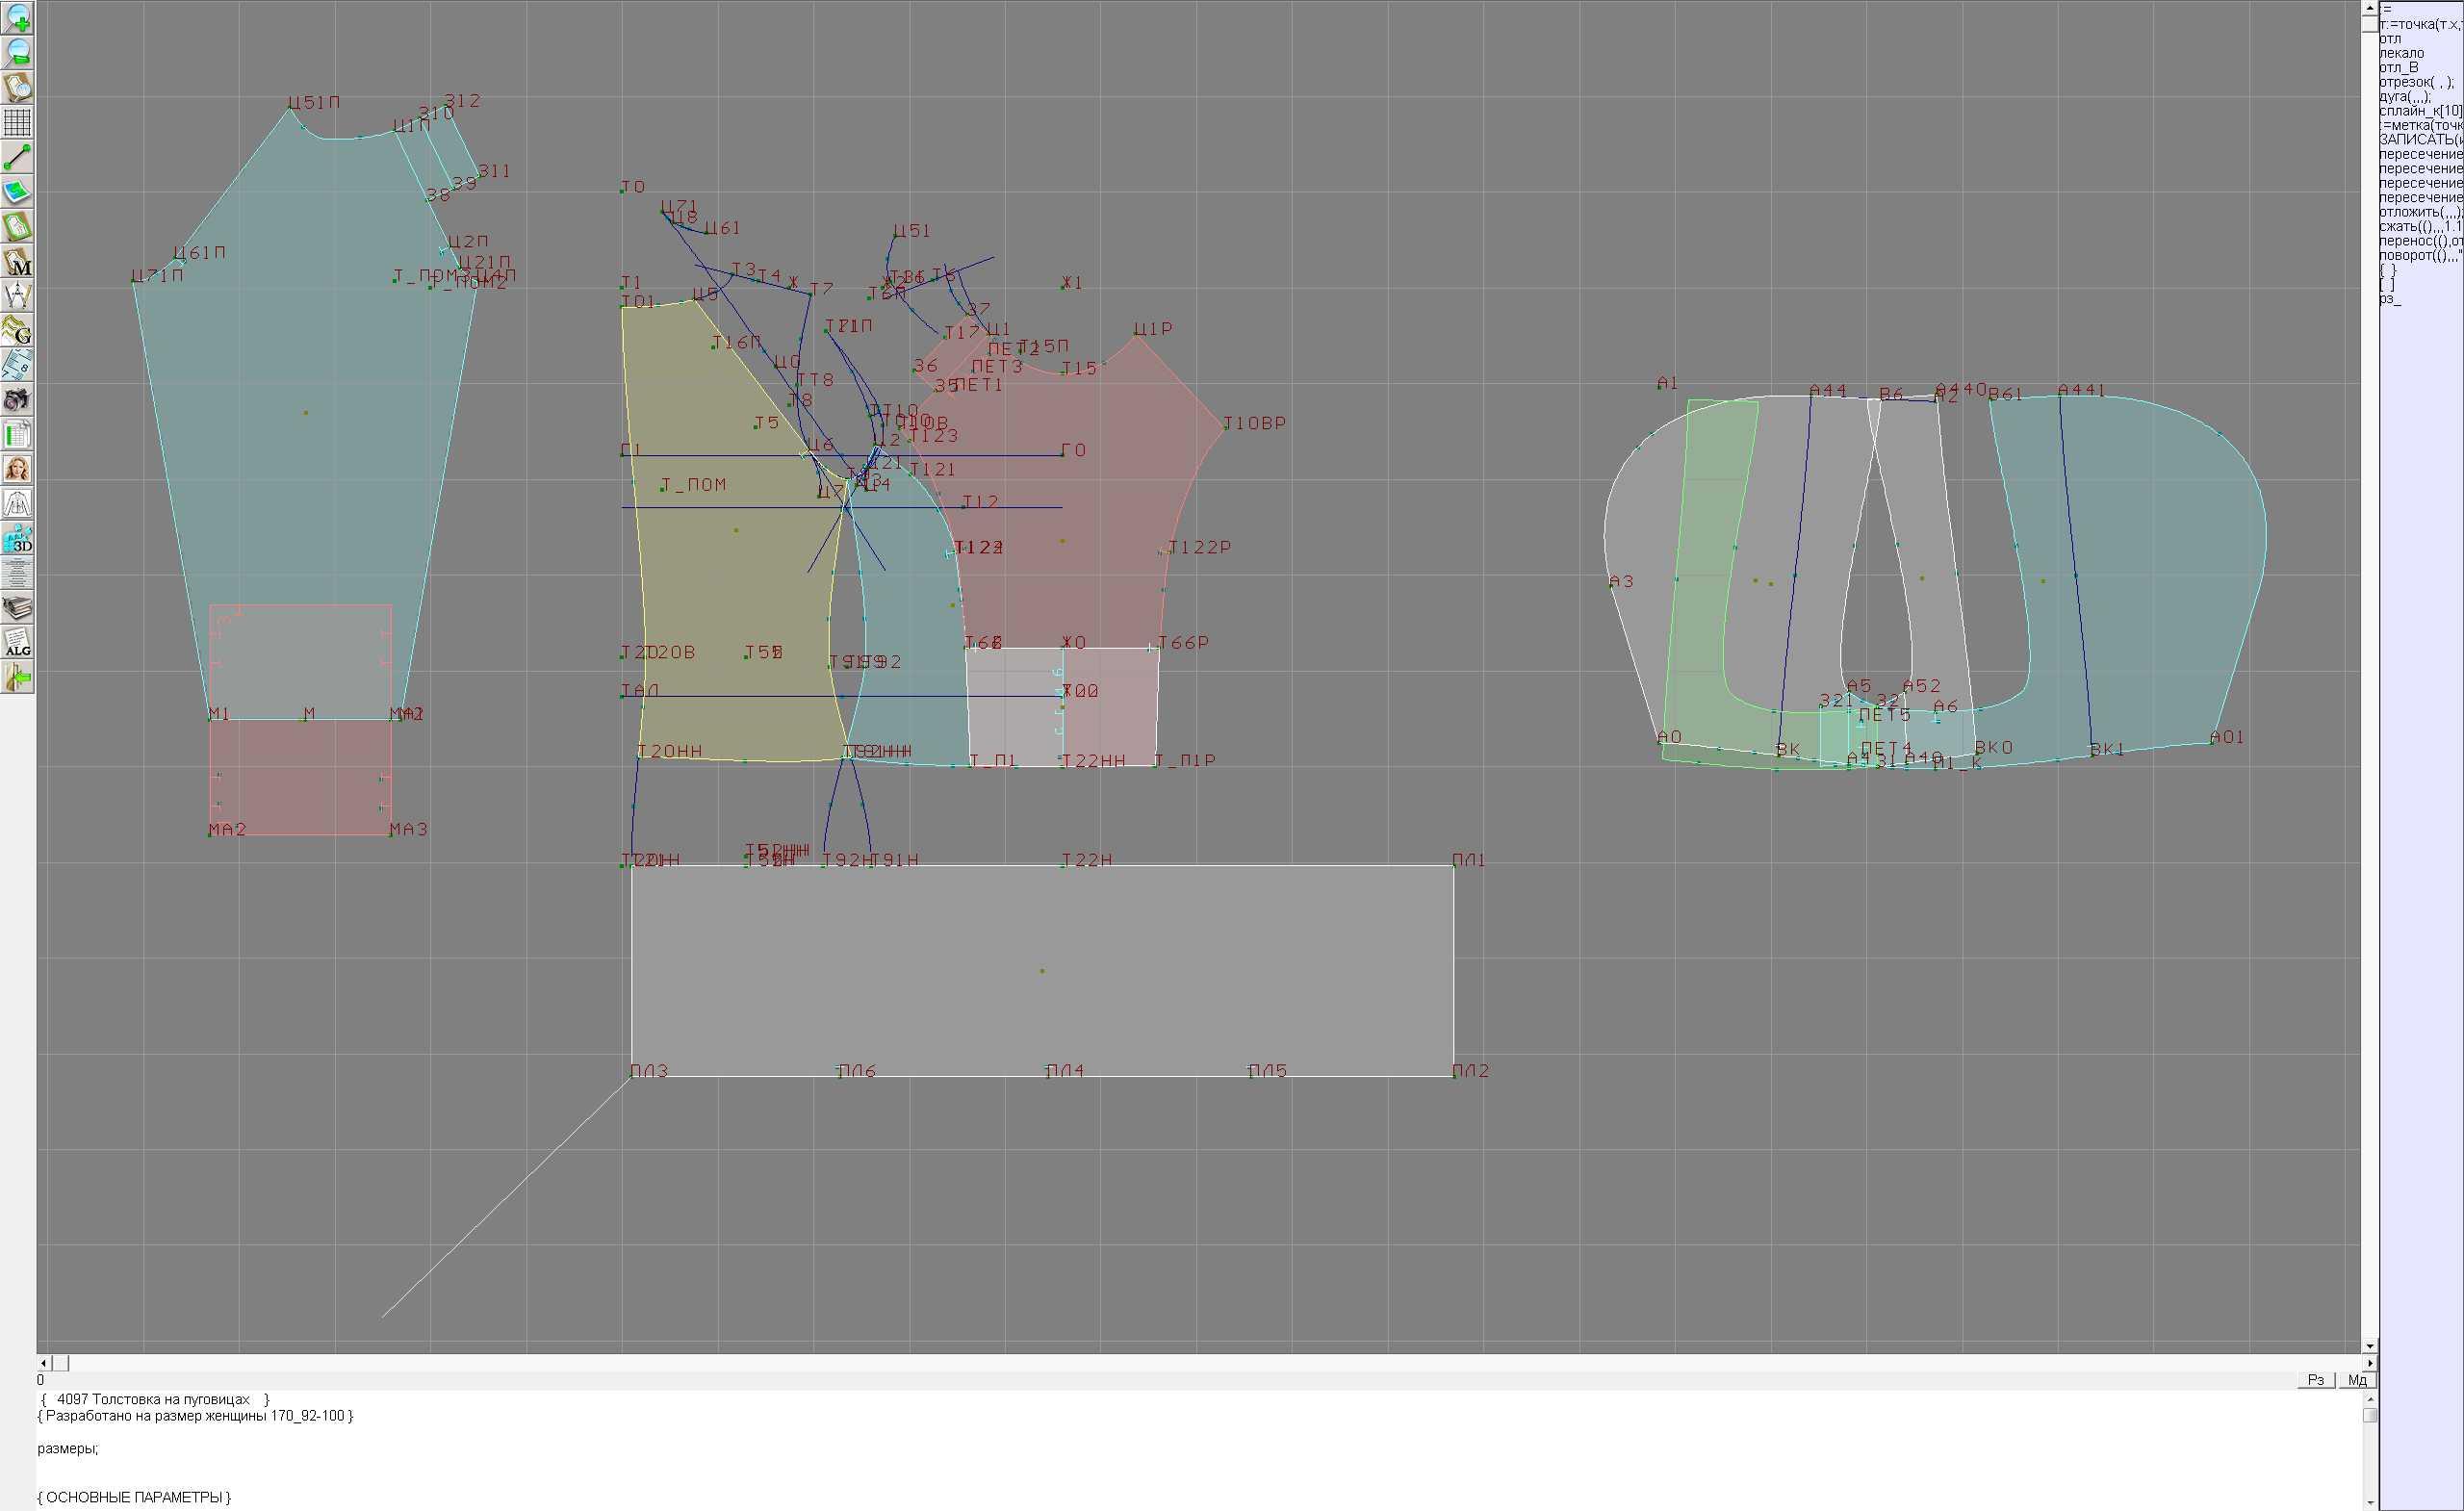 Sweatshirt Sewing Pattern 4097 Made To Measure Sewing